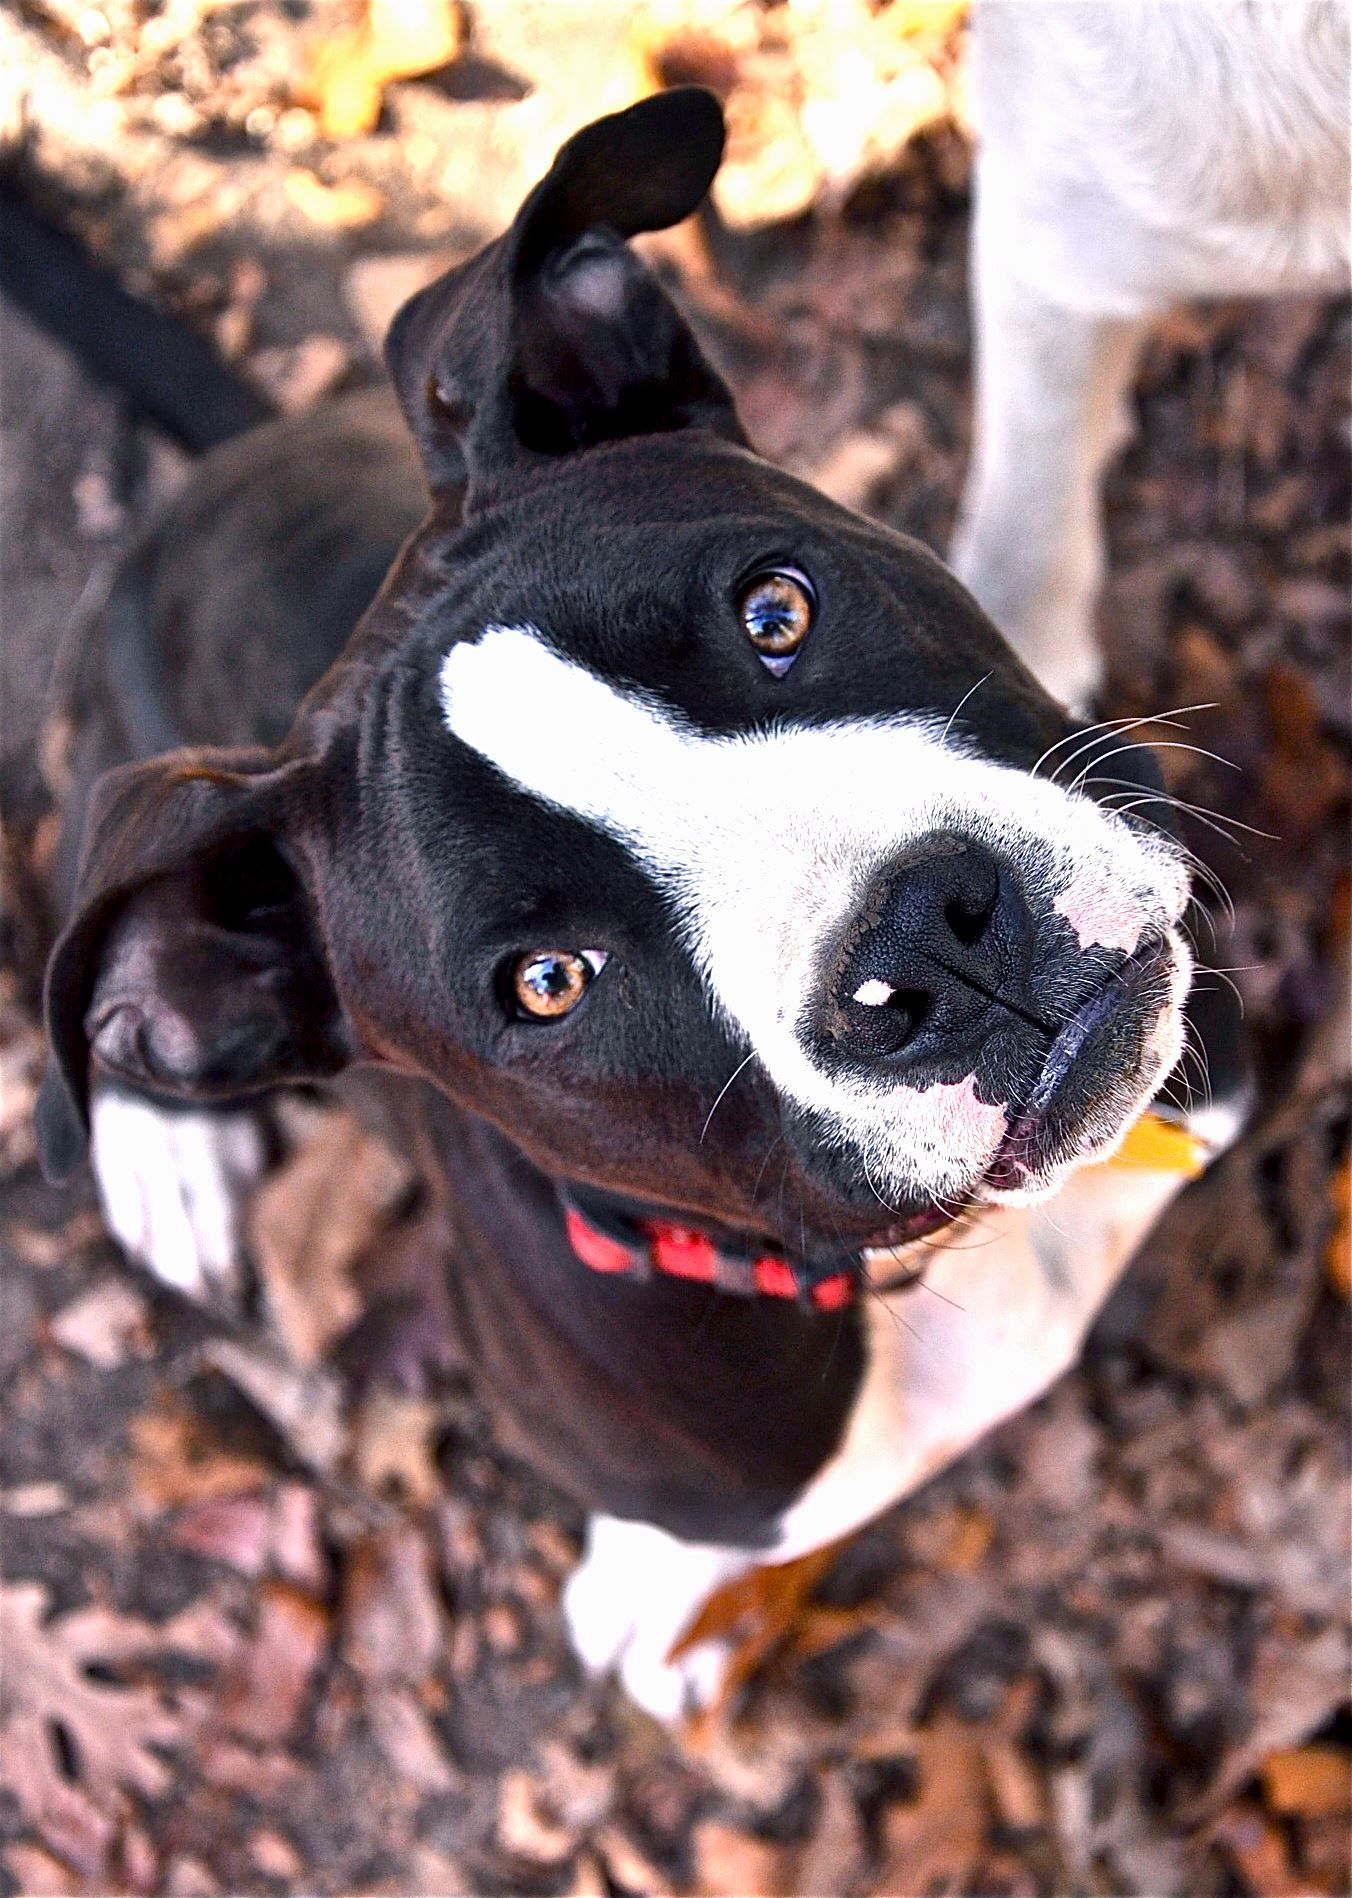 Donation/Adoption/Bake sale. Matthews, NC target/ACmoore